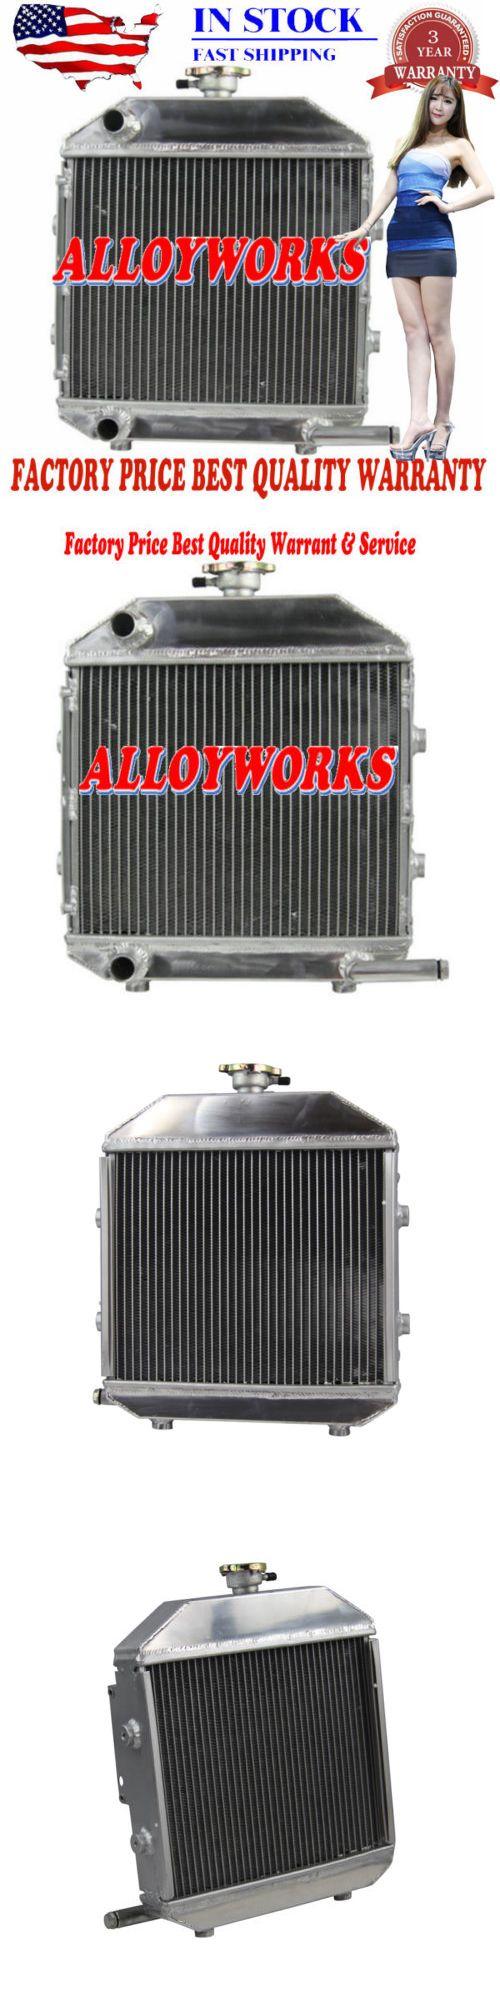 heavy equipment: Oem Nos Sba310100211 Aluminum Radiator For Ford 1300 Tractor -> BUY IT NOW ONLY: $93.05 on eBay!